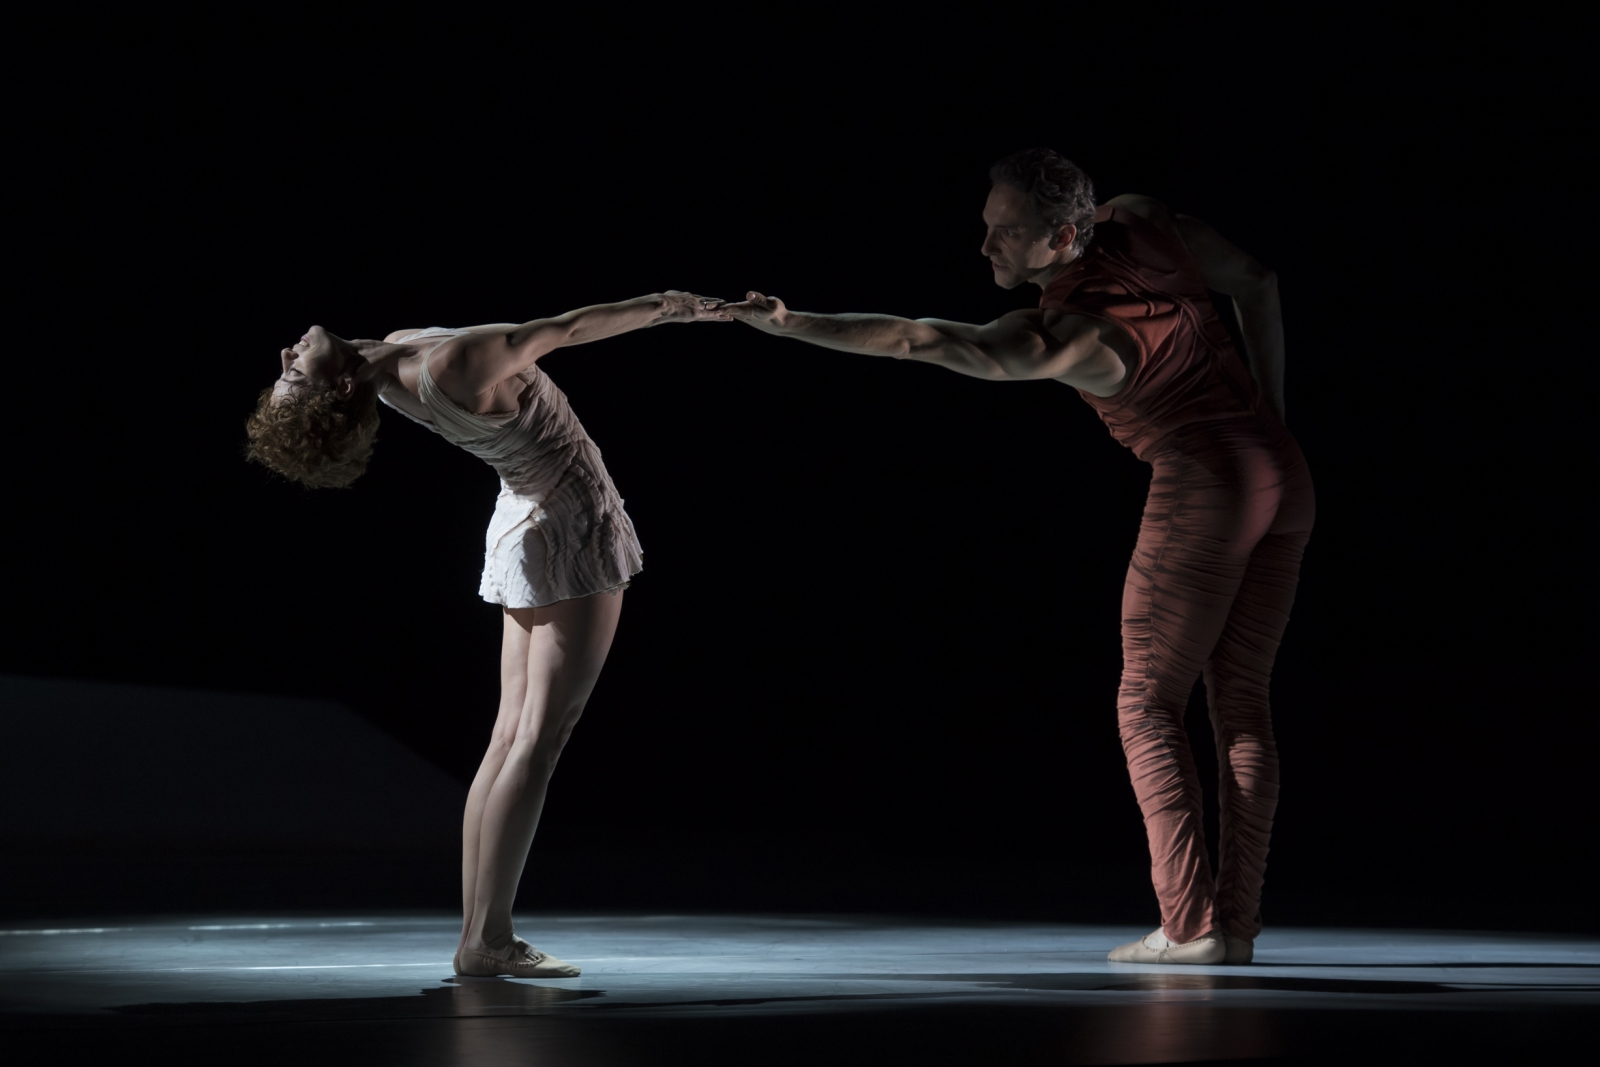 Daphnis & Chloé Maillot